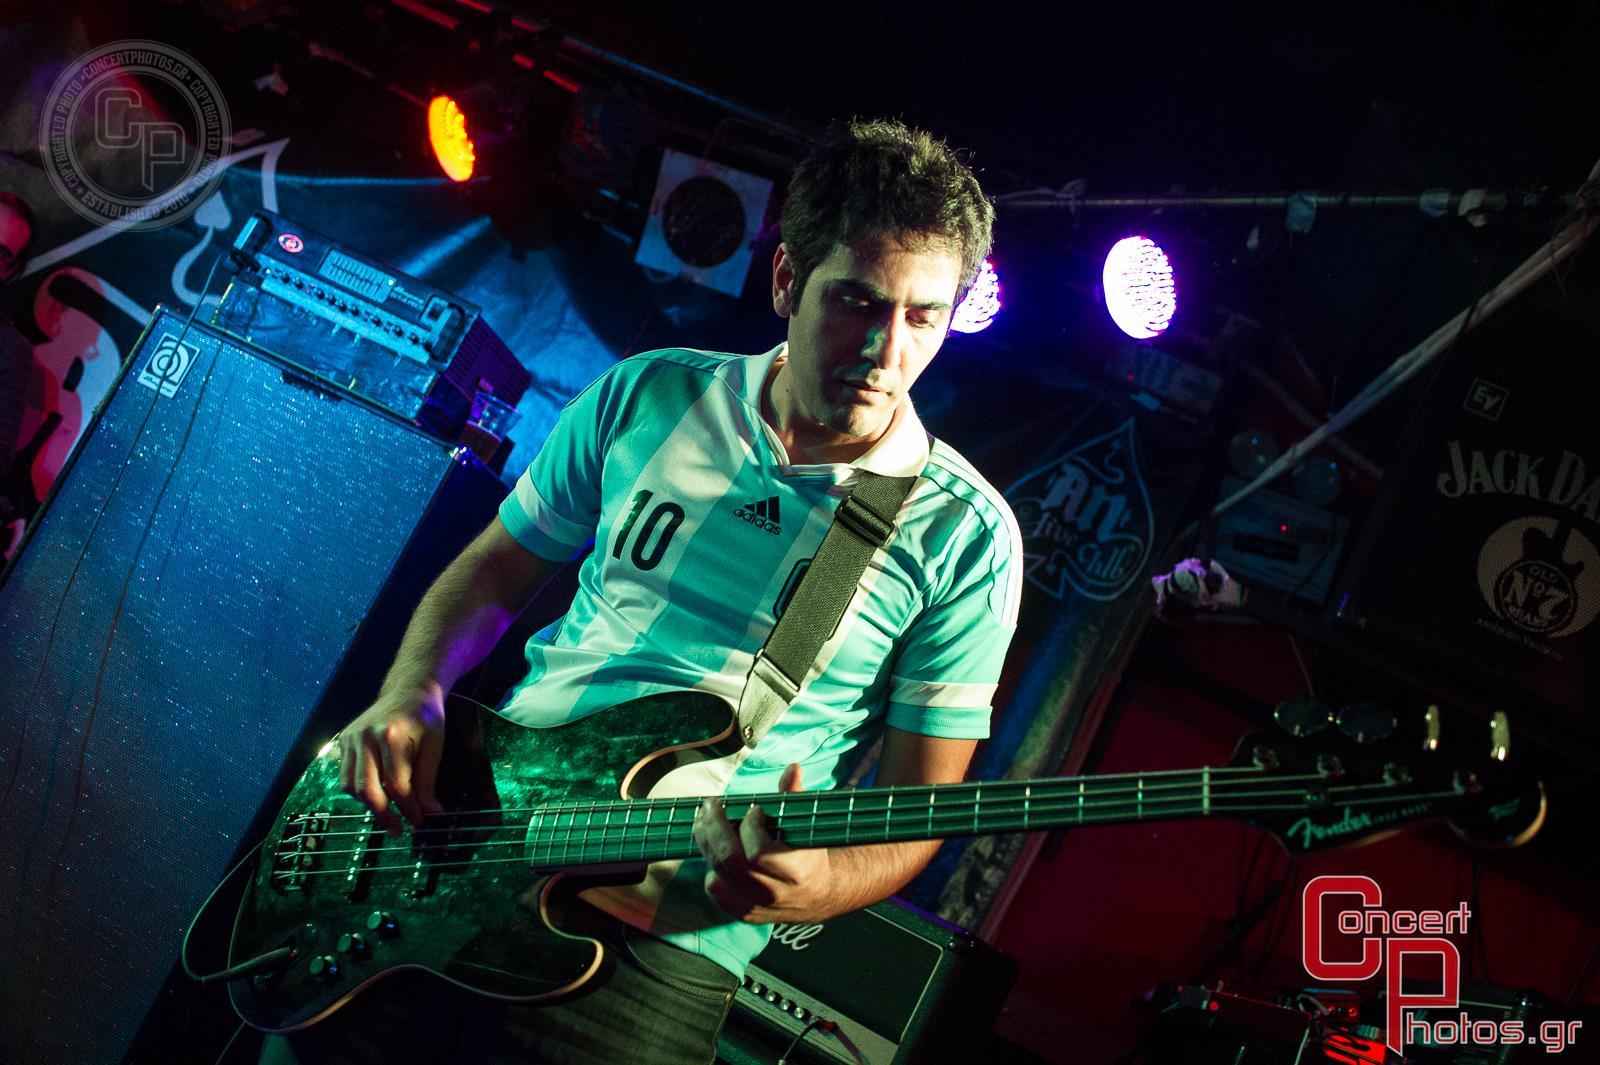 Battle Of The Bands Leg 1-Battle Of The Bands Leg 1 photographer:  - ConcertPhotos - 20141126_2314_44